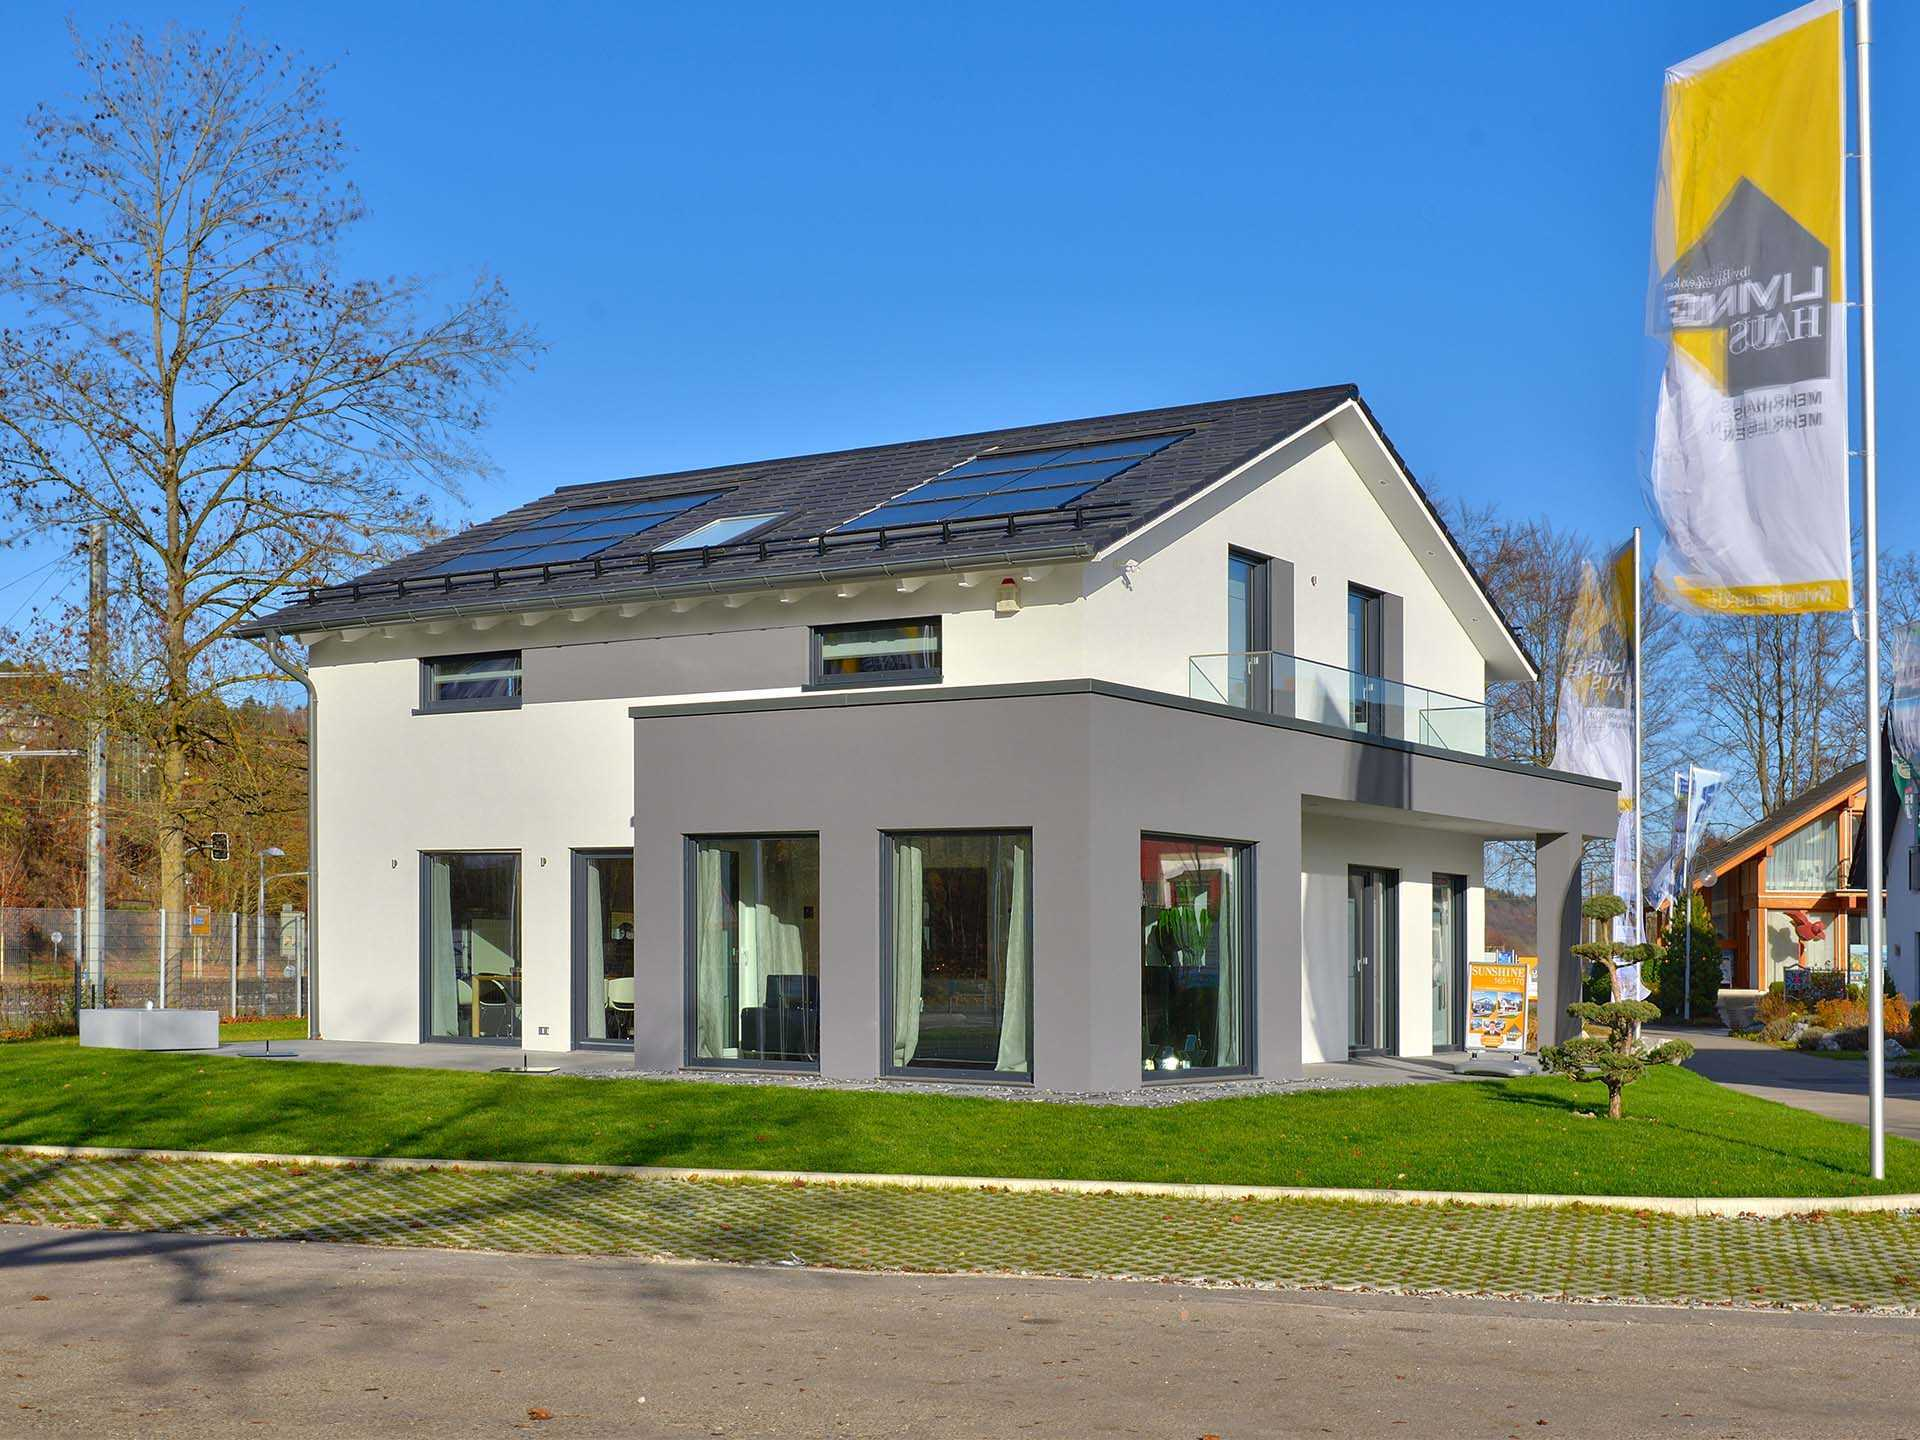 Musterhaus SUNSHINE Ulm - Living Haus | Musterhaus.net